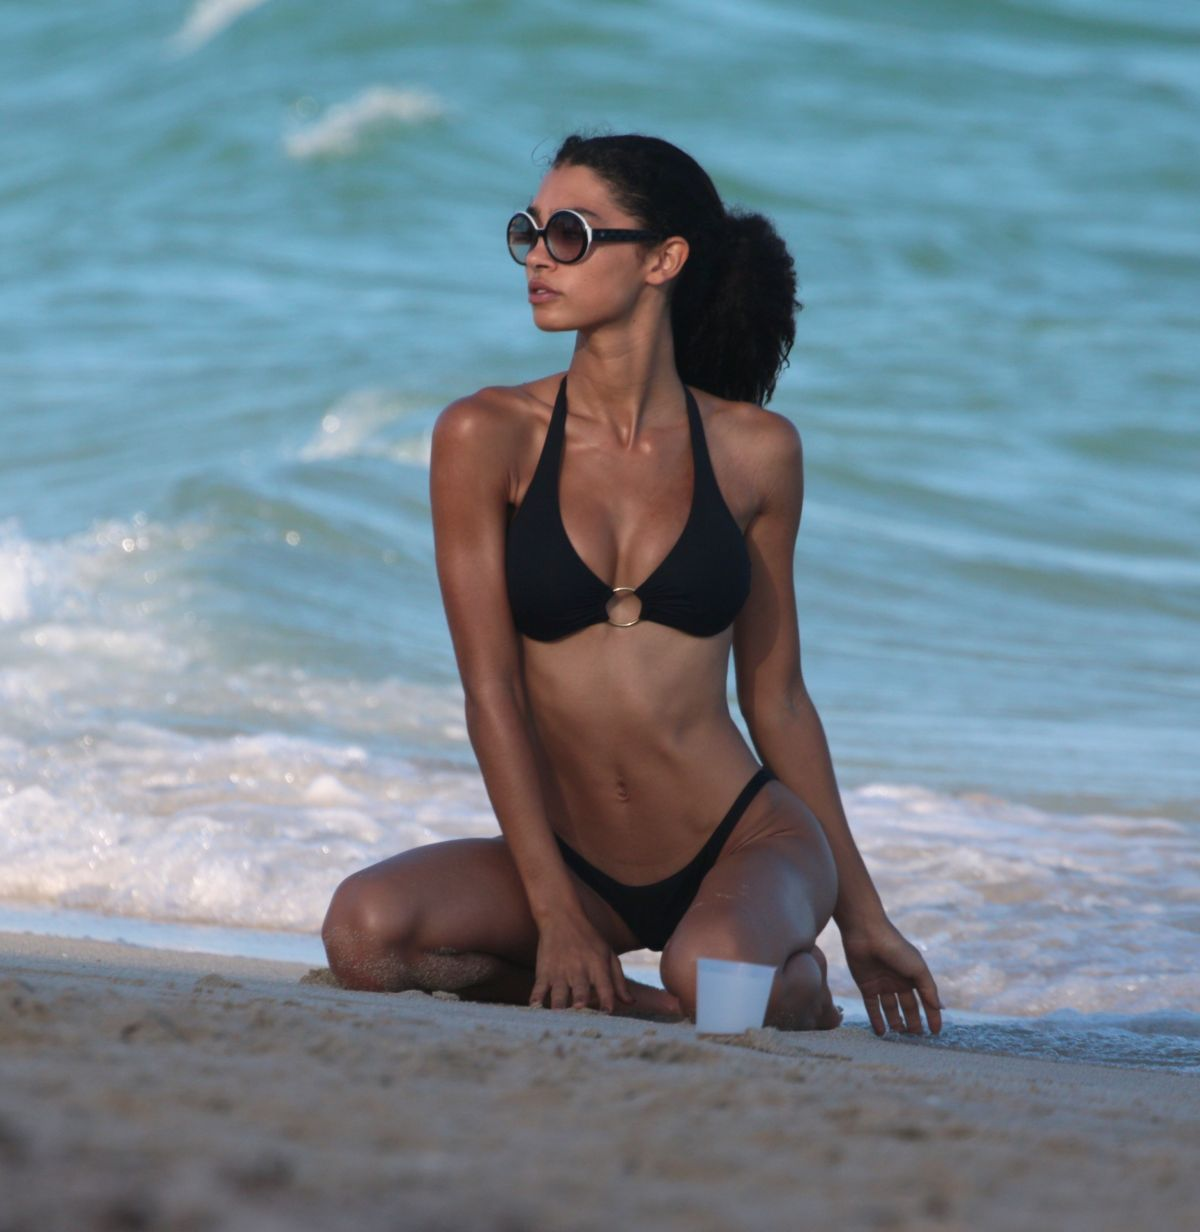 Leaked Danielle Herrington Raven Lyn nudes (19 images), Hot